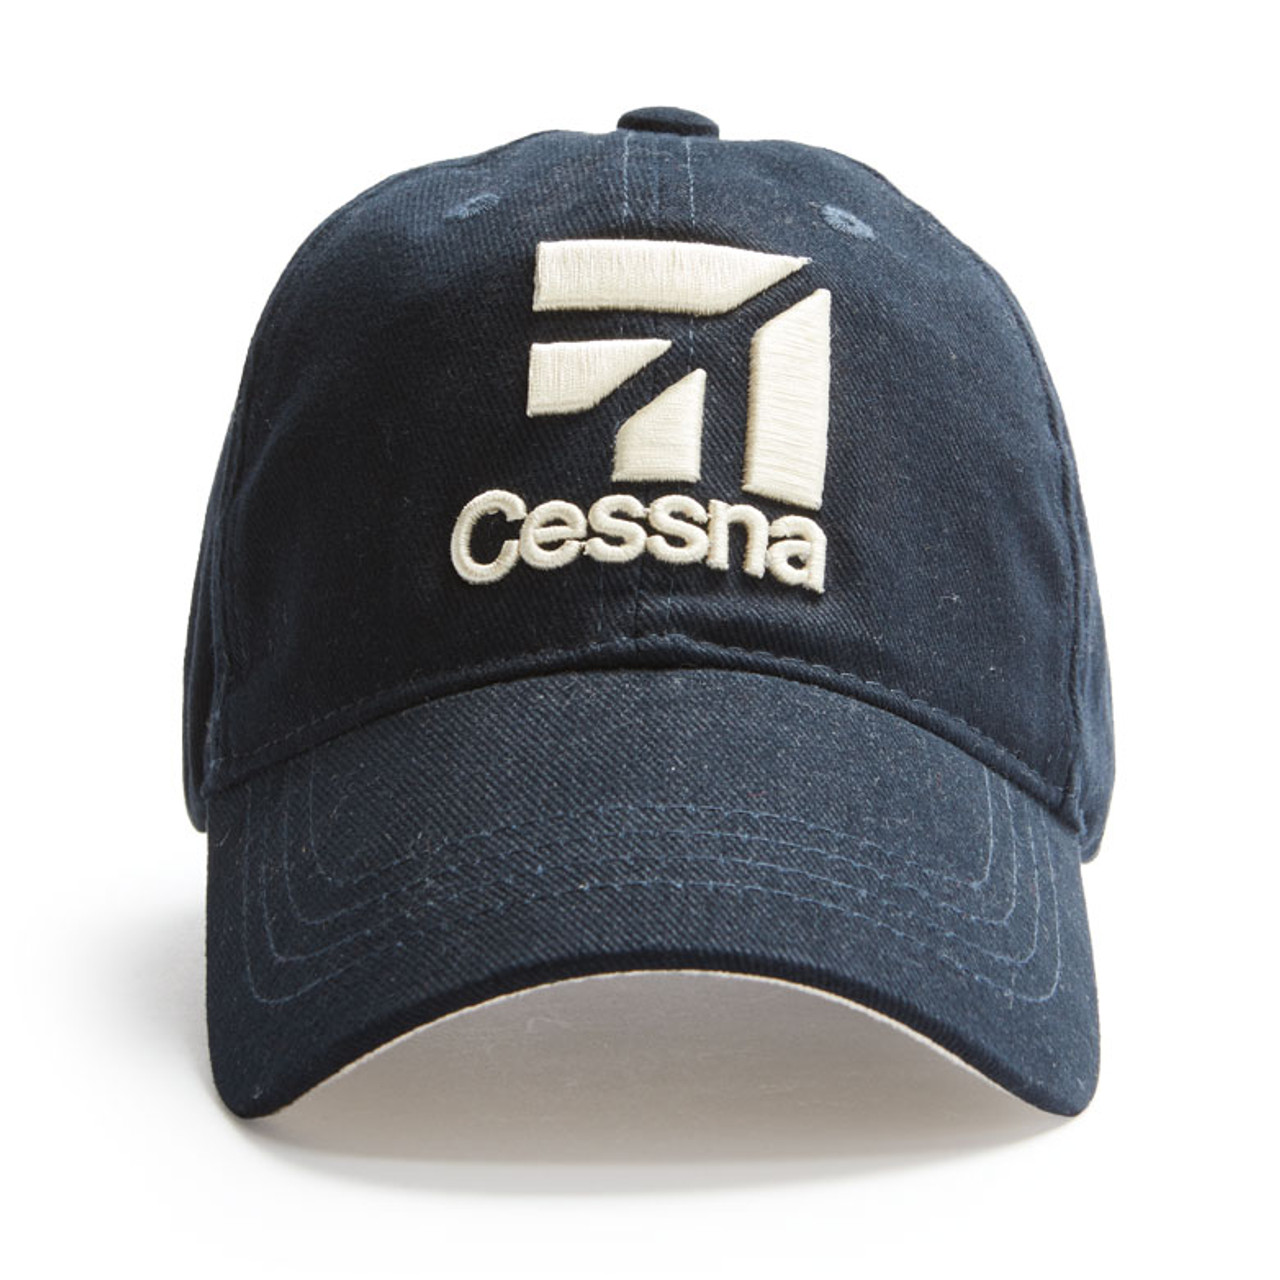 Cessna Logo Cap (Navy)